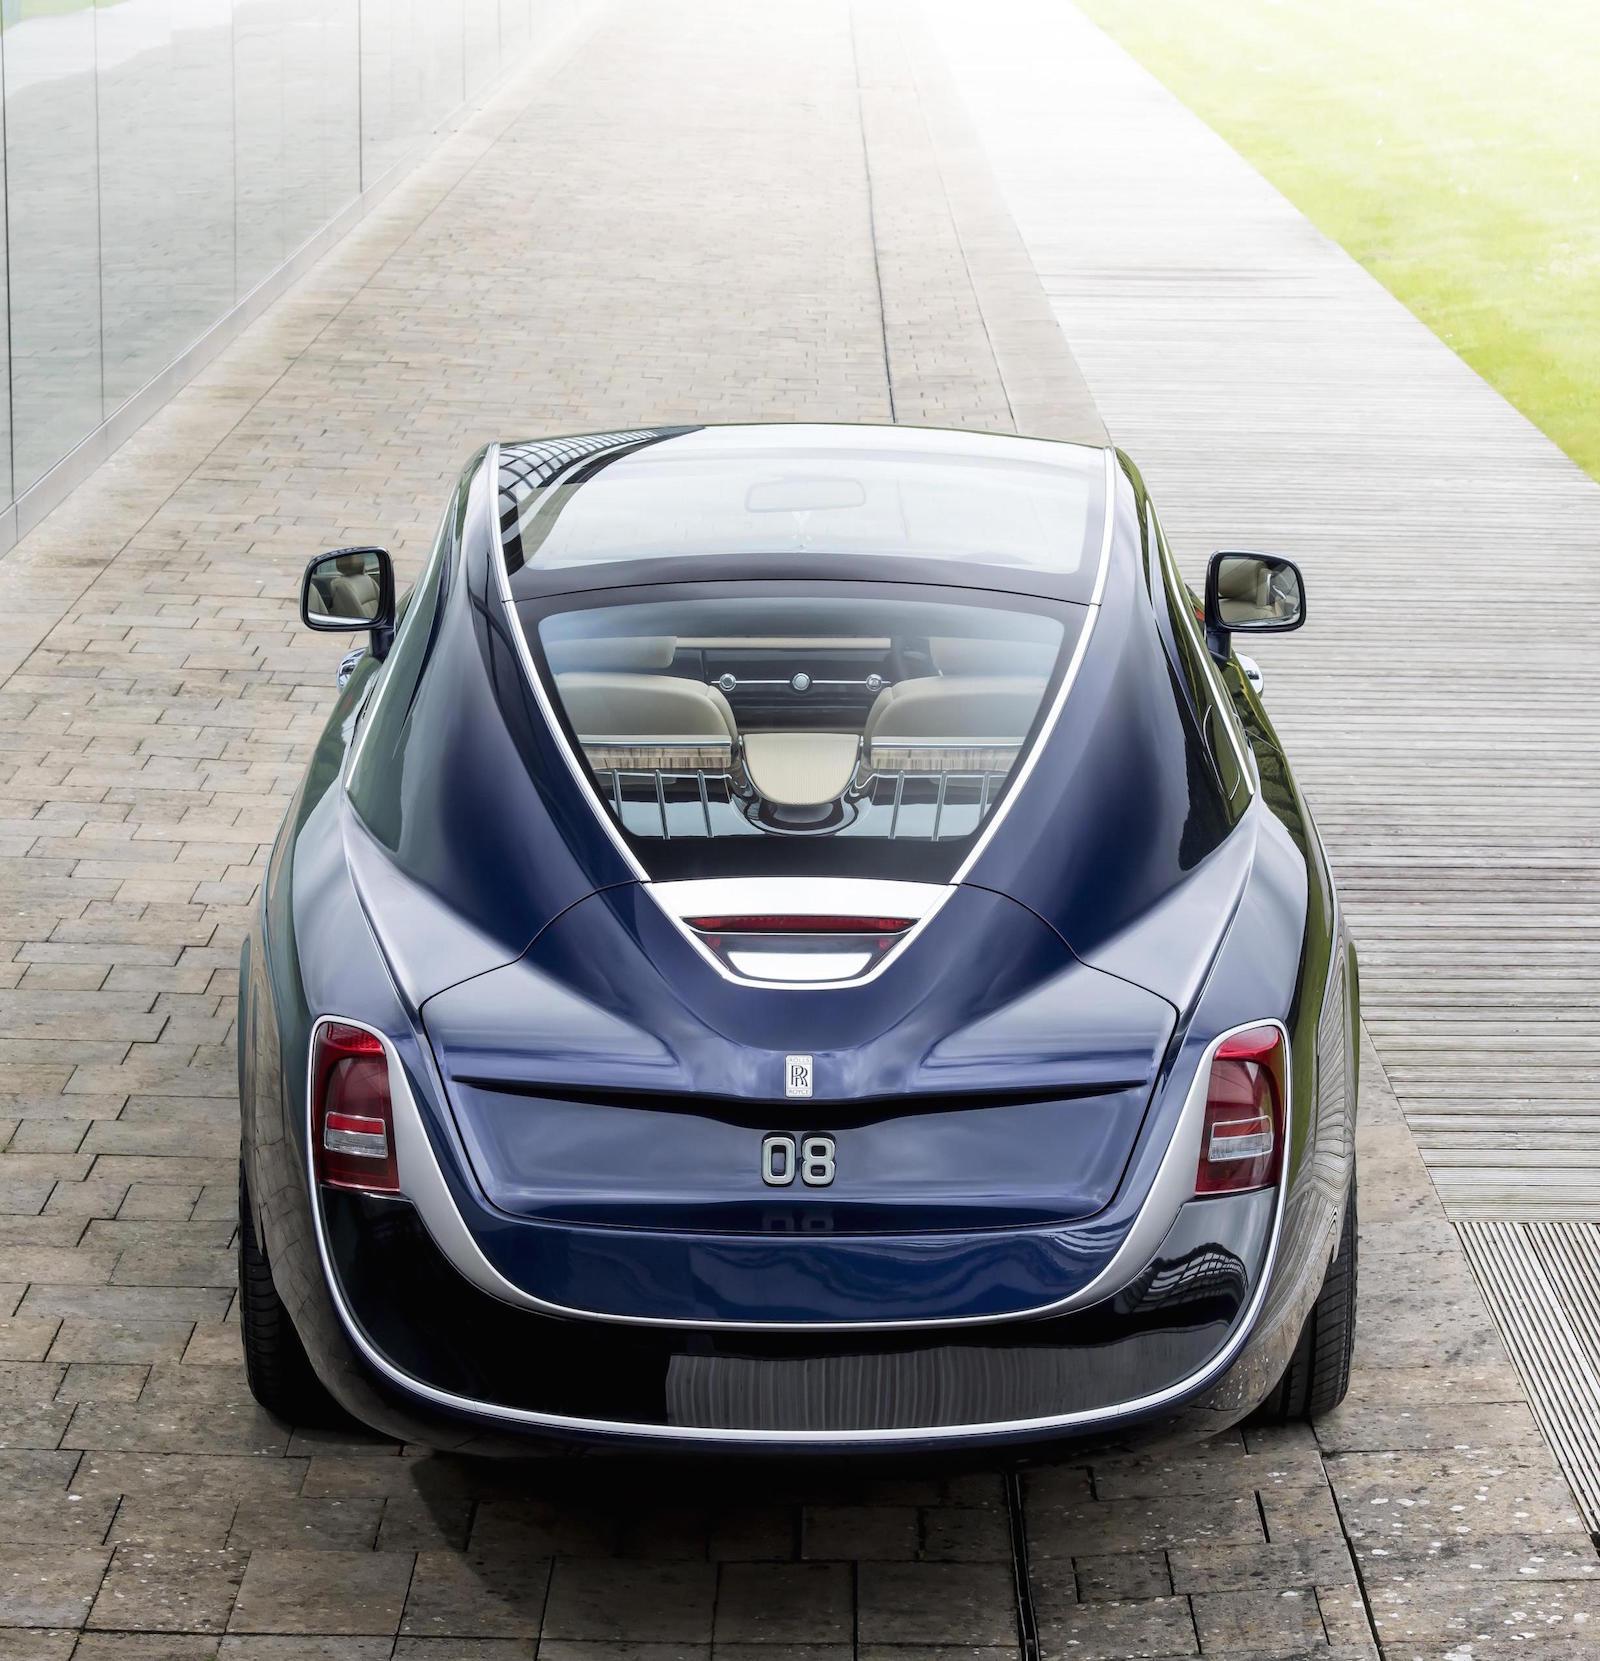 Rolls Royce Sweptail Debuts At Concorso D Eleganza